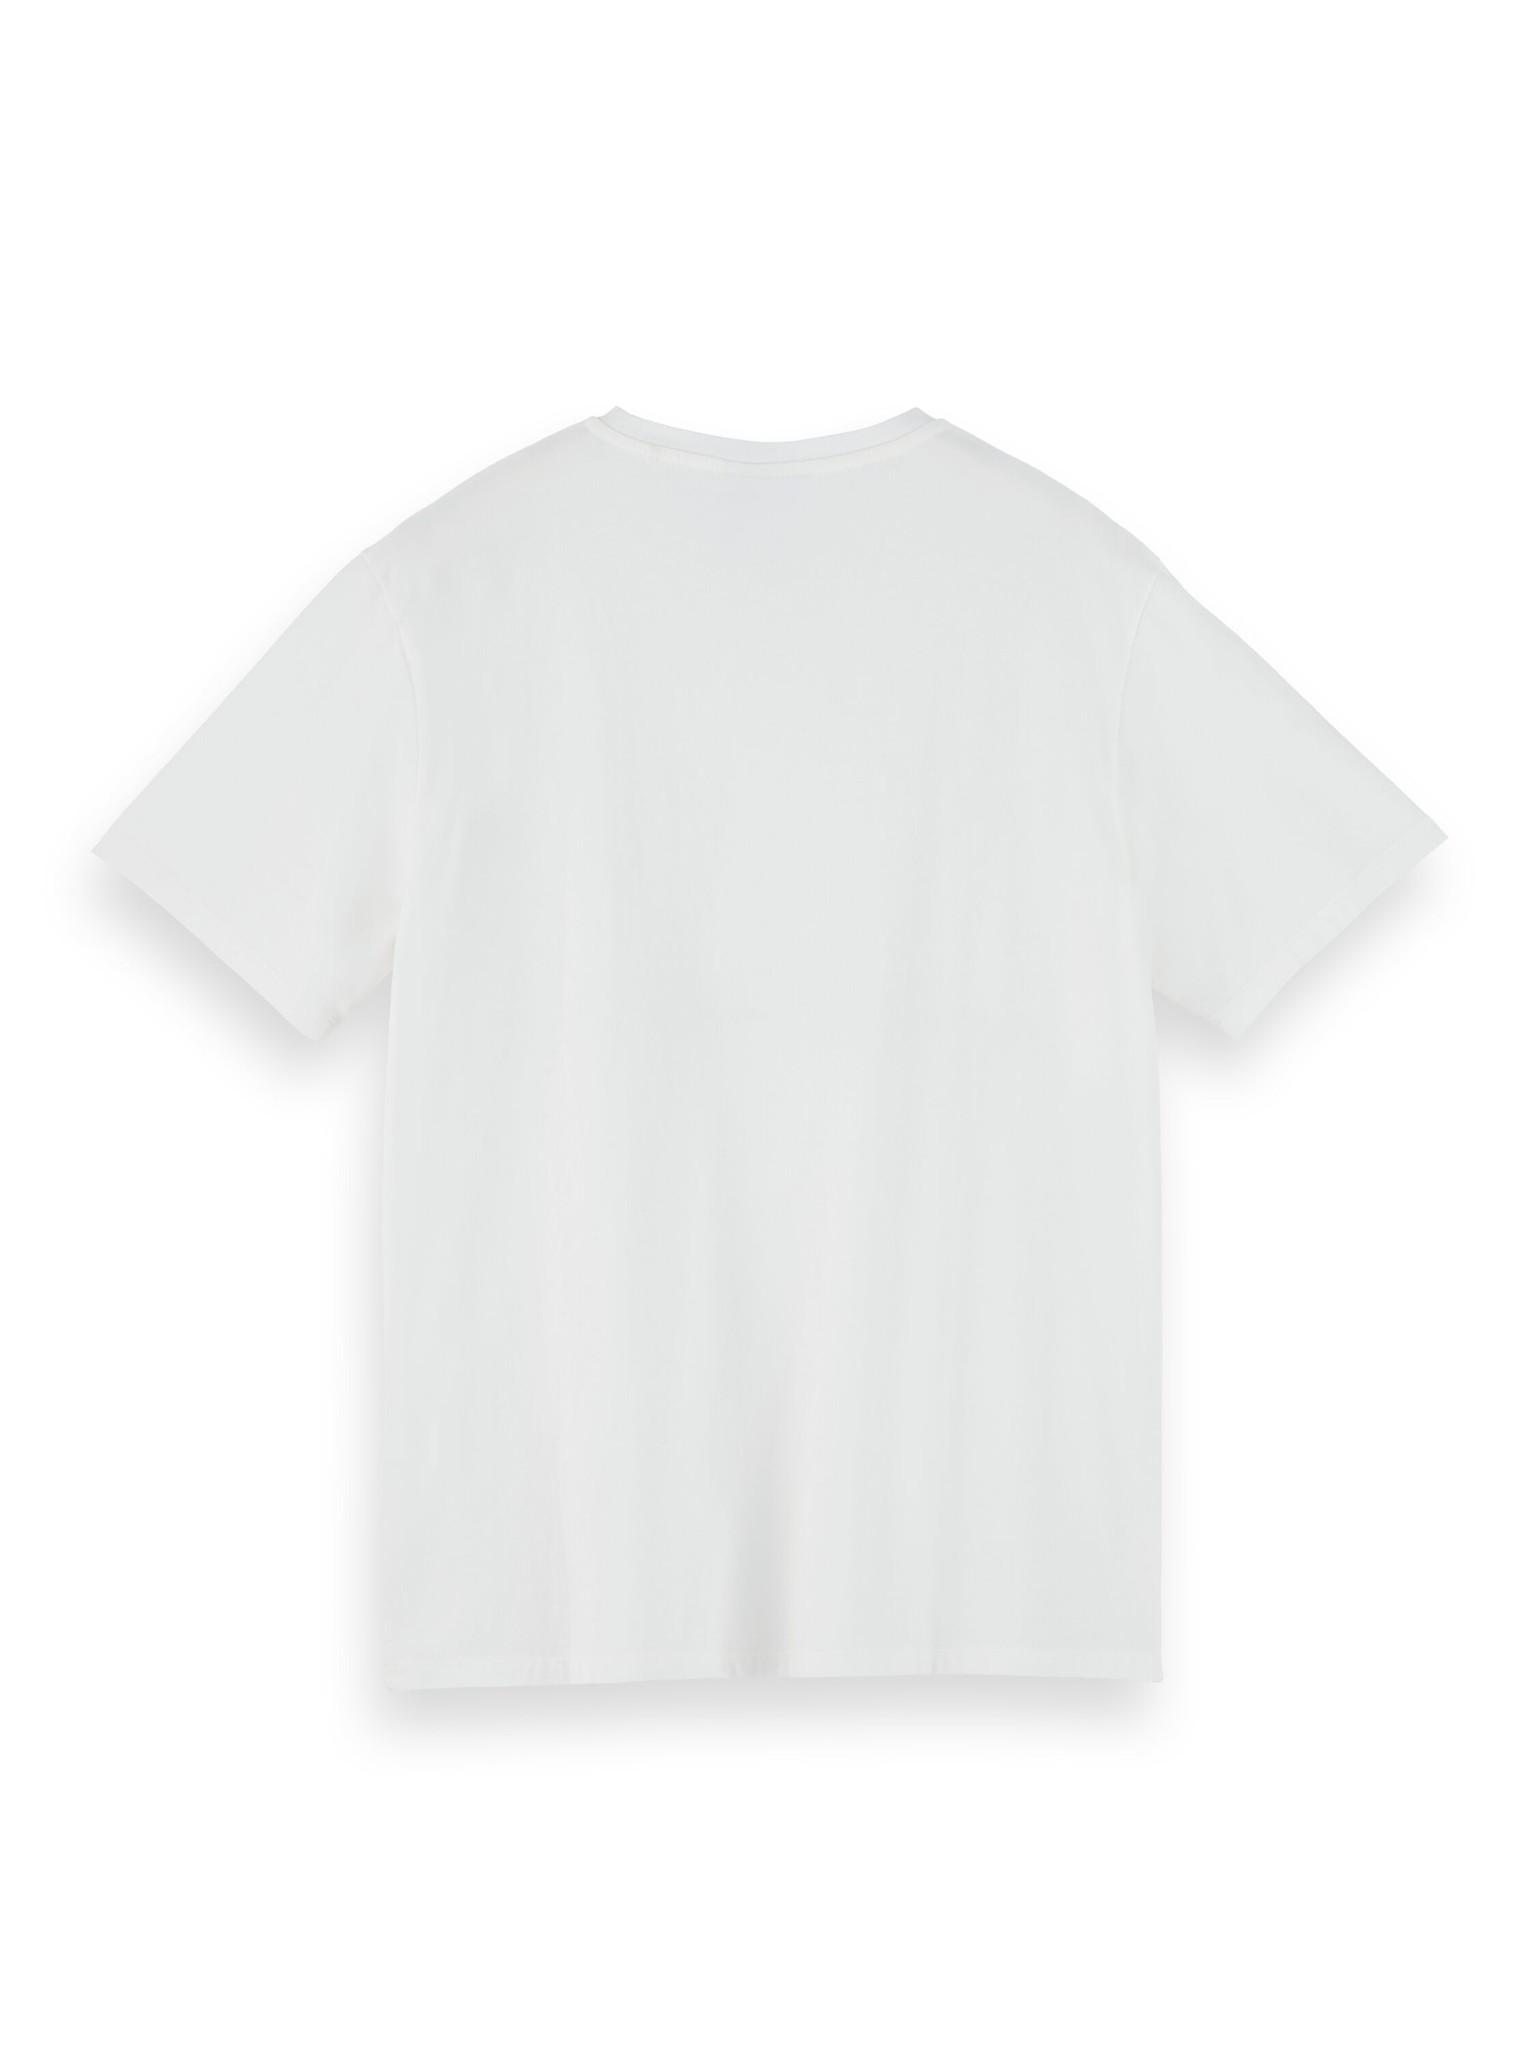 Scotch & Soda T-shirt Scotch & Soda 156807-0001